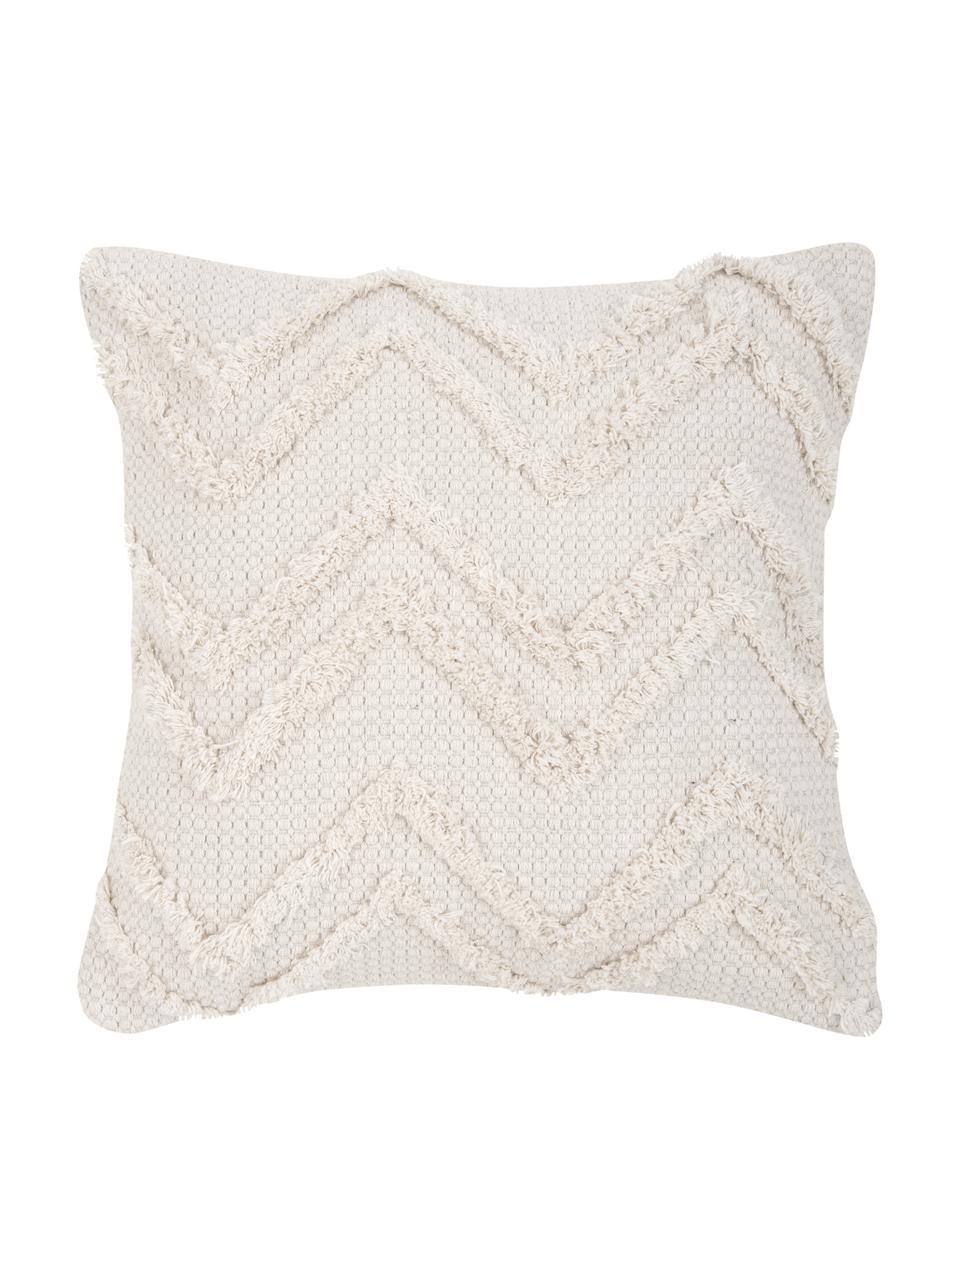 Federa arredo boho con motivo a zigzag  Akesha, 100% cotone, Ecru, Larg. 45 x Lung. 45 cm